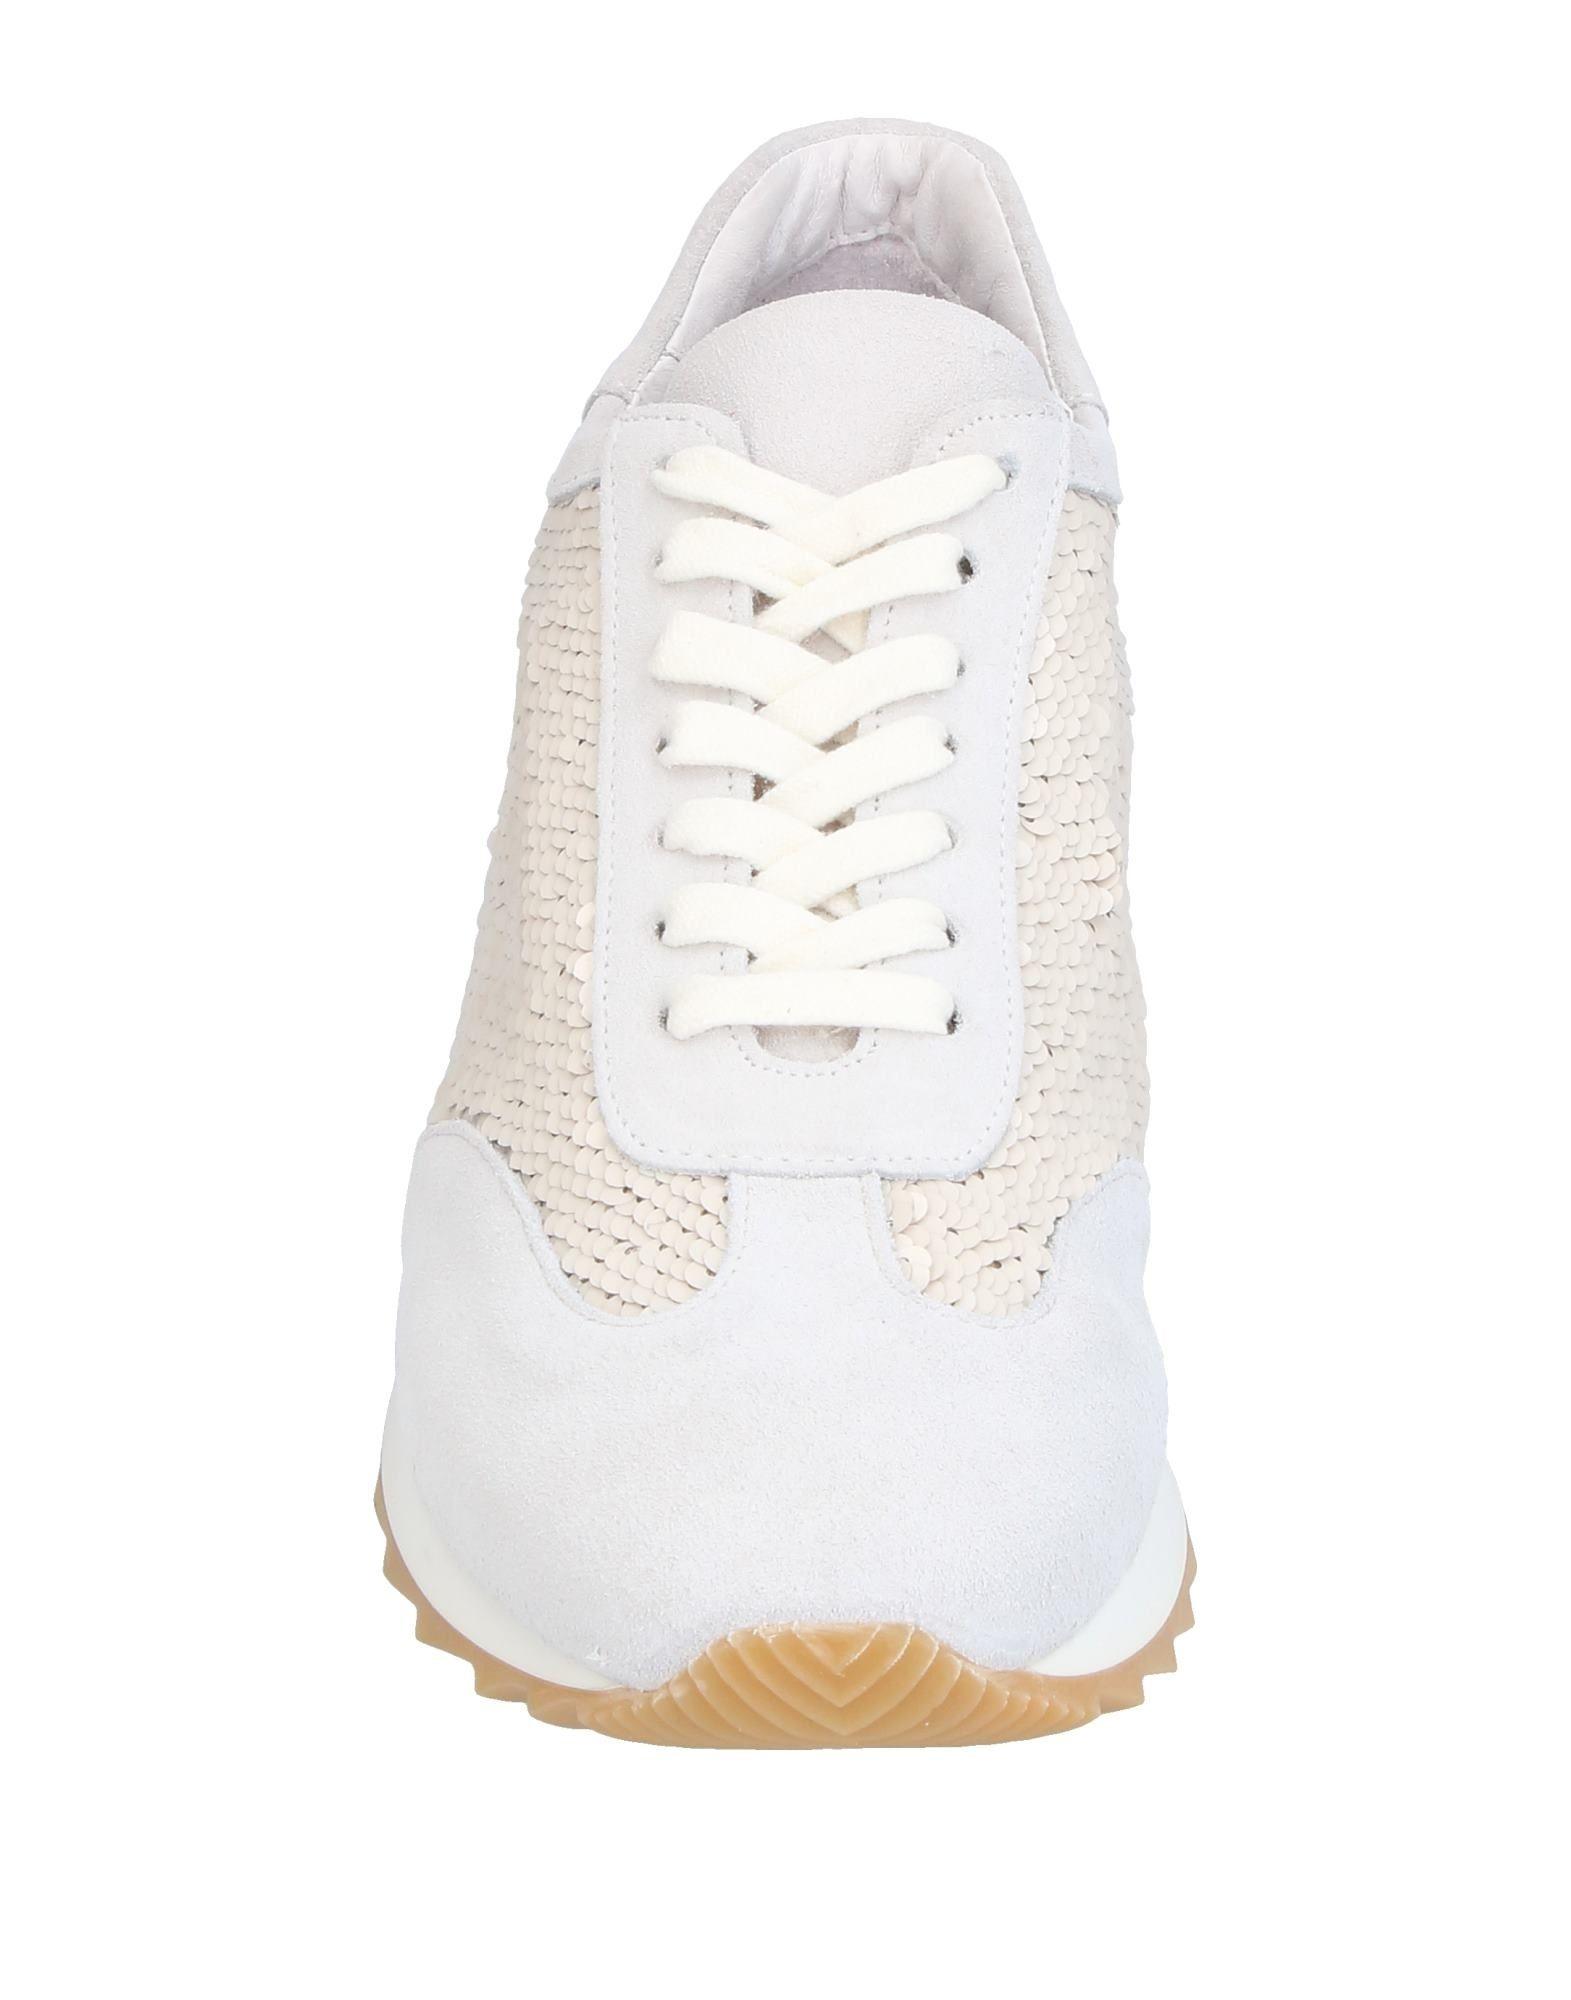 Sneakers Stele Femme - Sneakers Stele sur